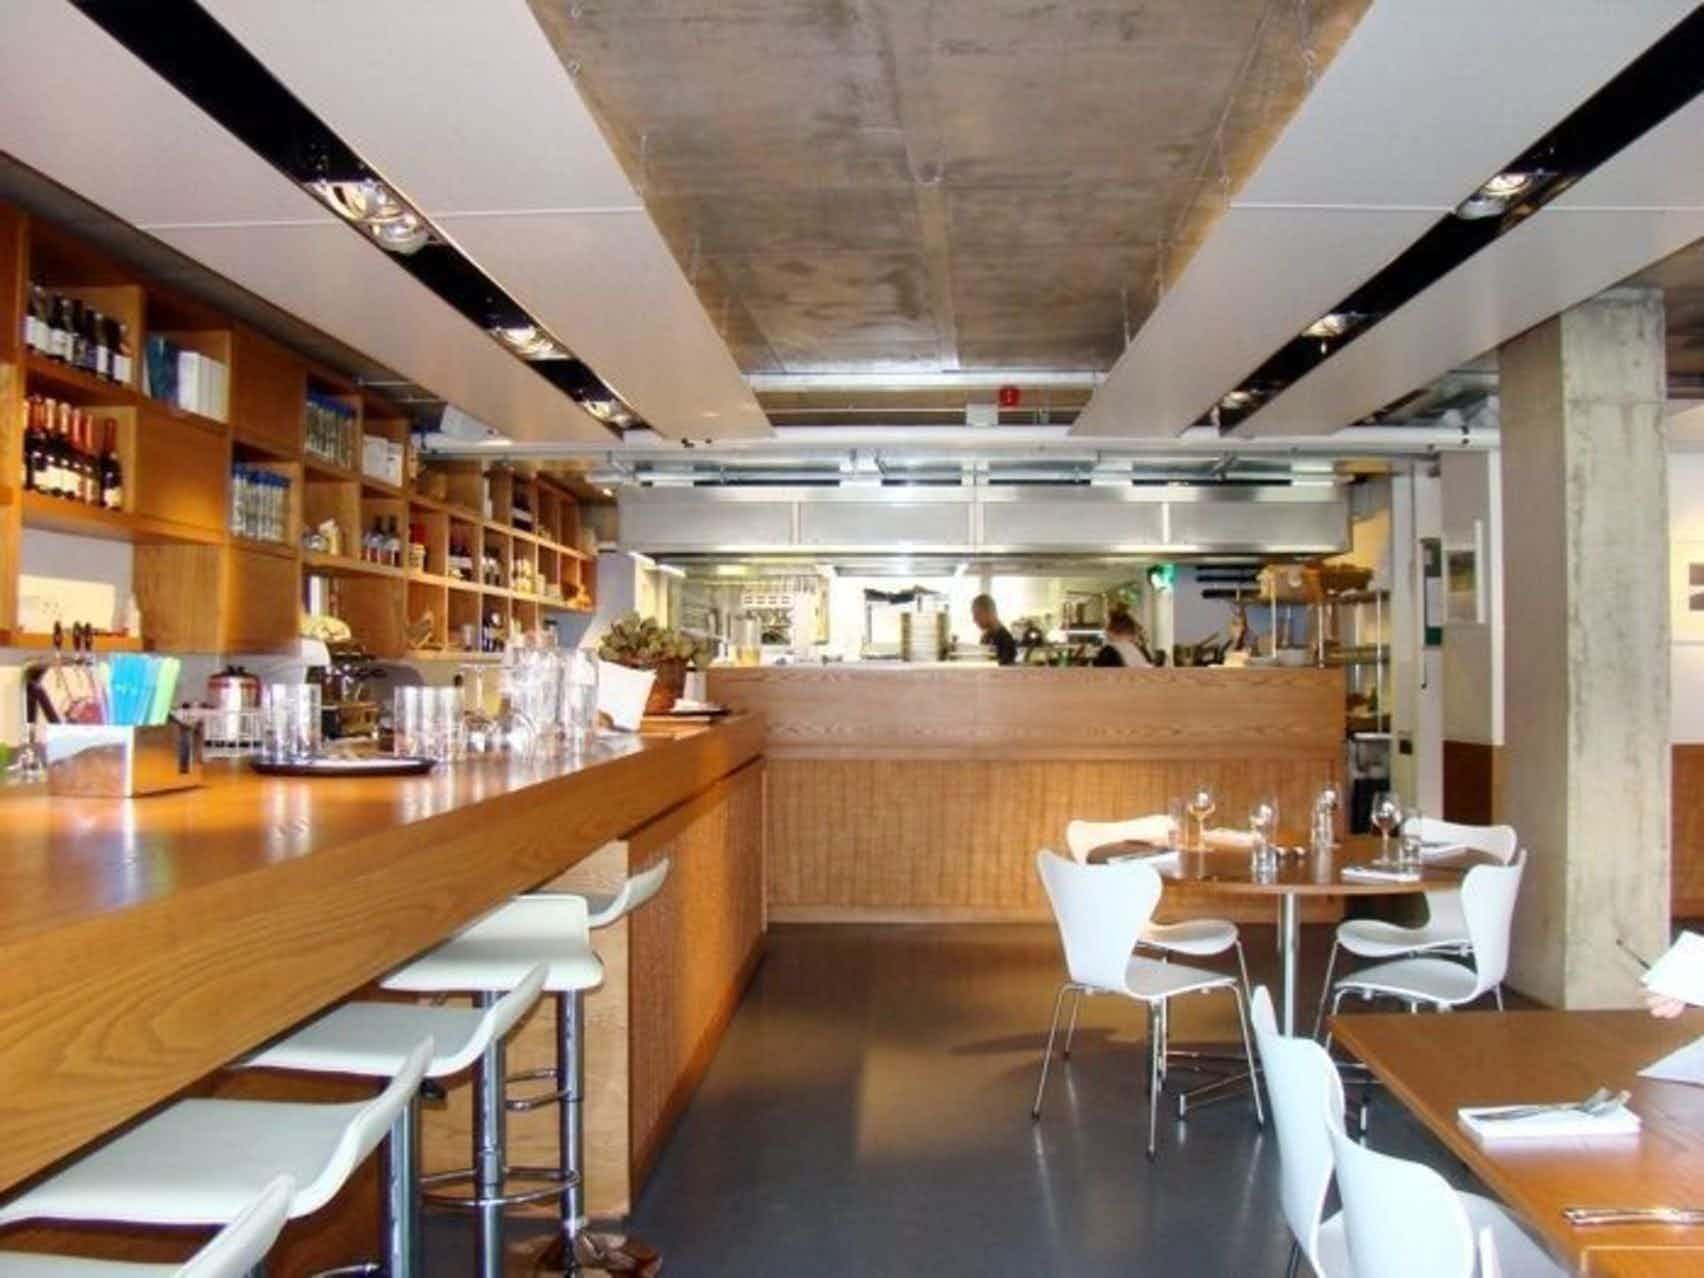 Exclusive Venue Hire, Day Hire, Waterhouse Restaurant